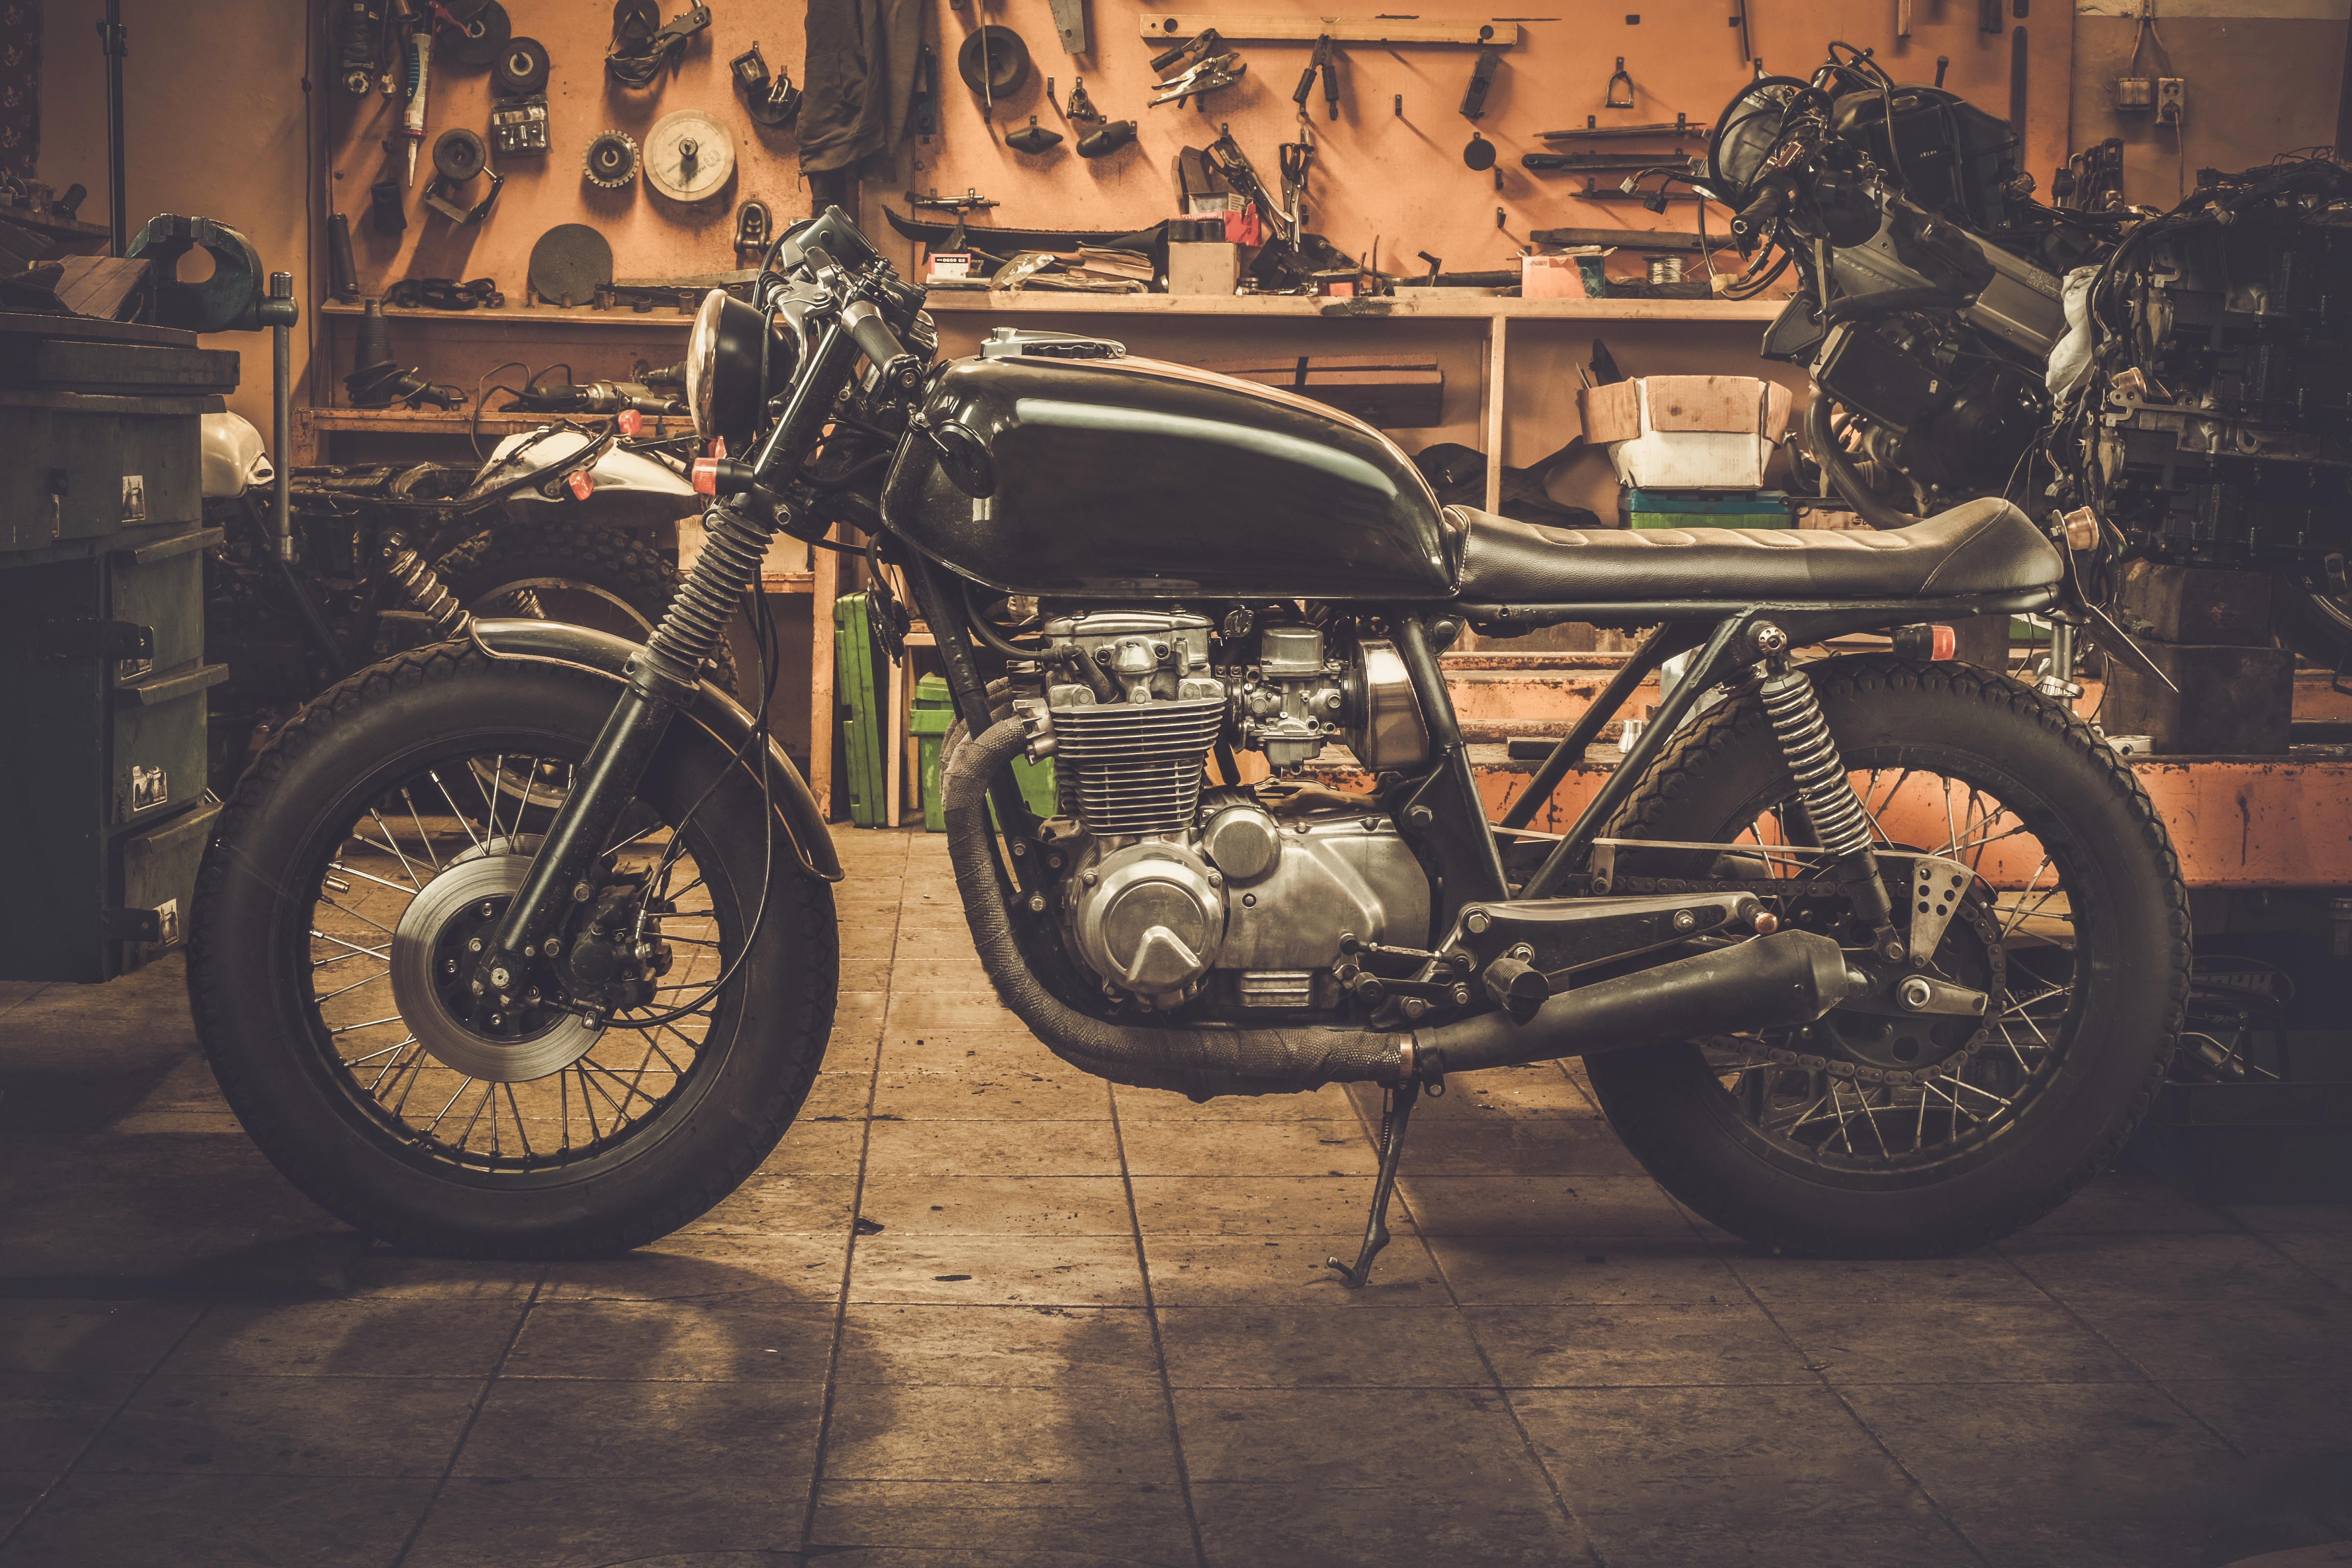 Motorcycle 4k Ultra HD Wallpaper   Background Image ...